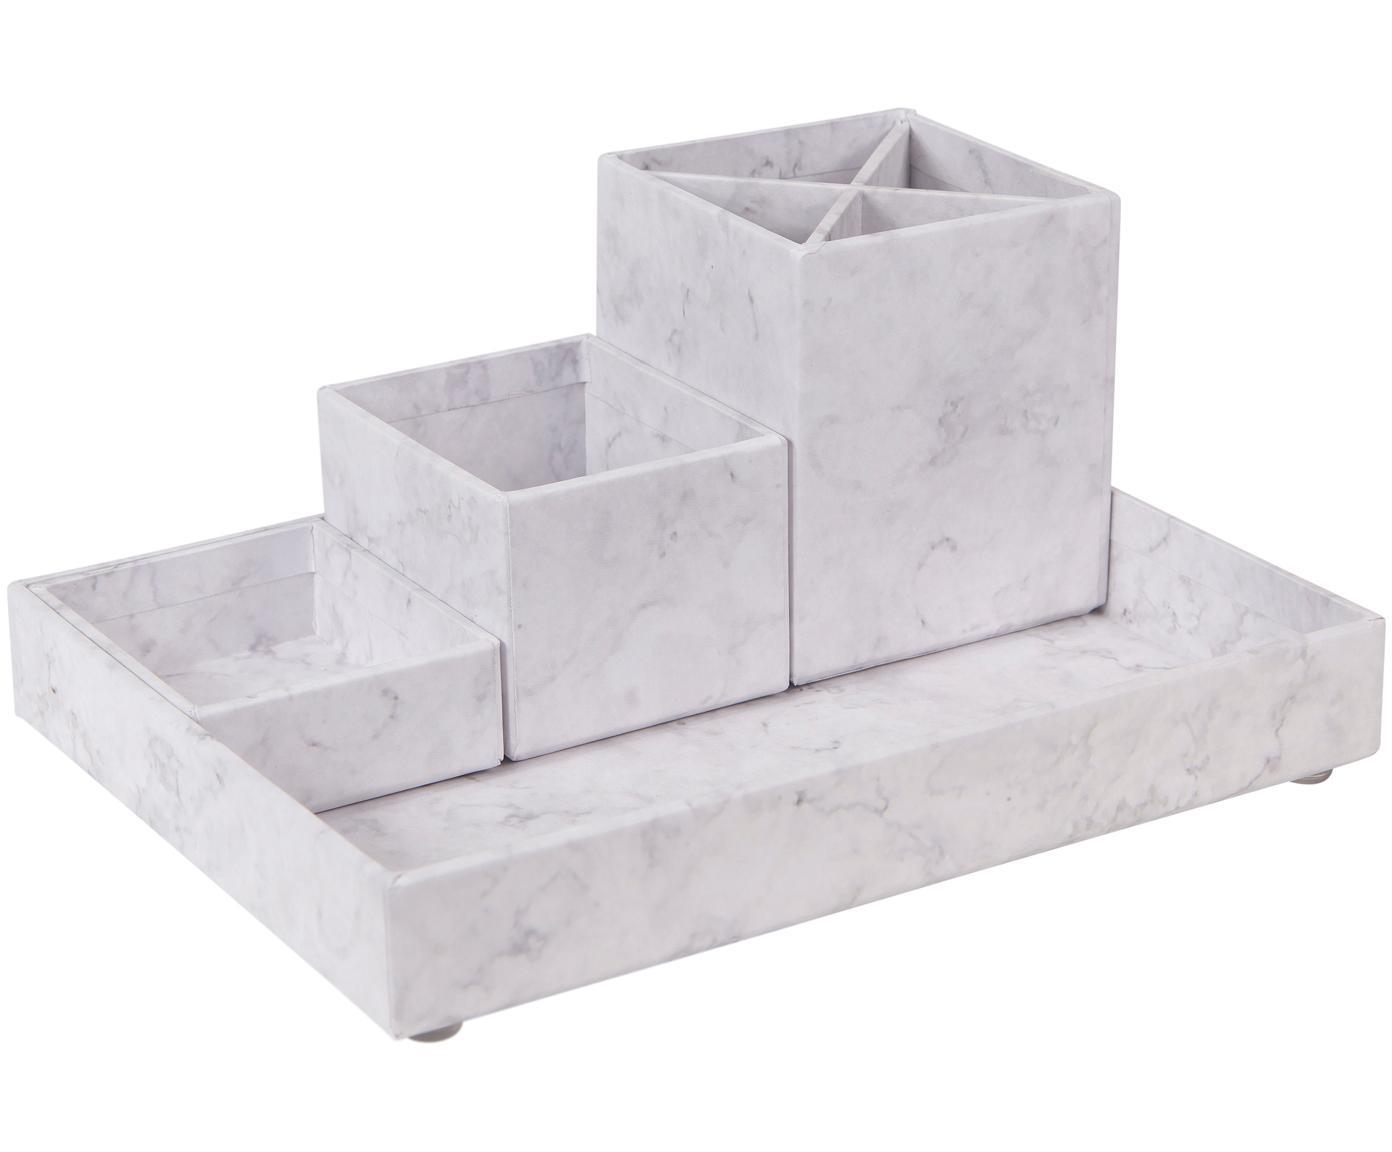 Büro-Organizer-Set Lena, 4-tlg., fester, laminierter Karton, Weiss, marmoriert, Verschiedene Grössen